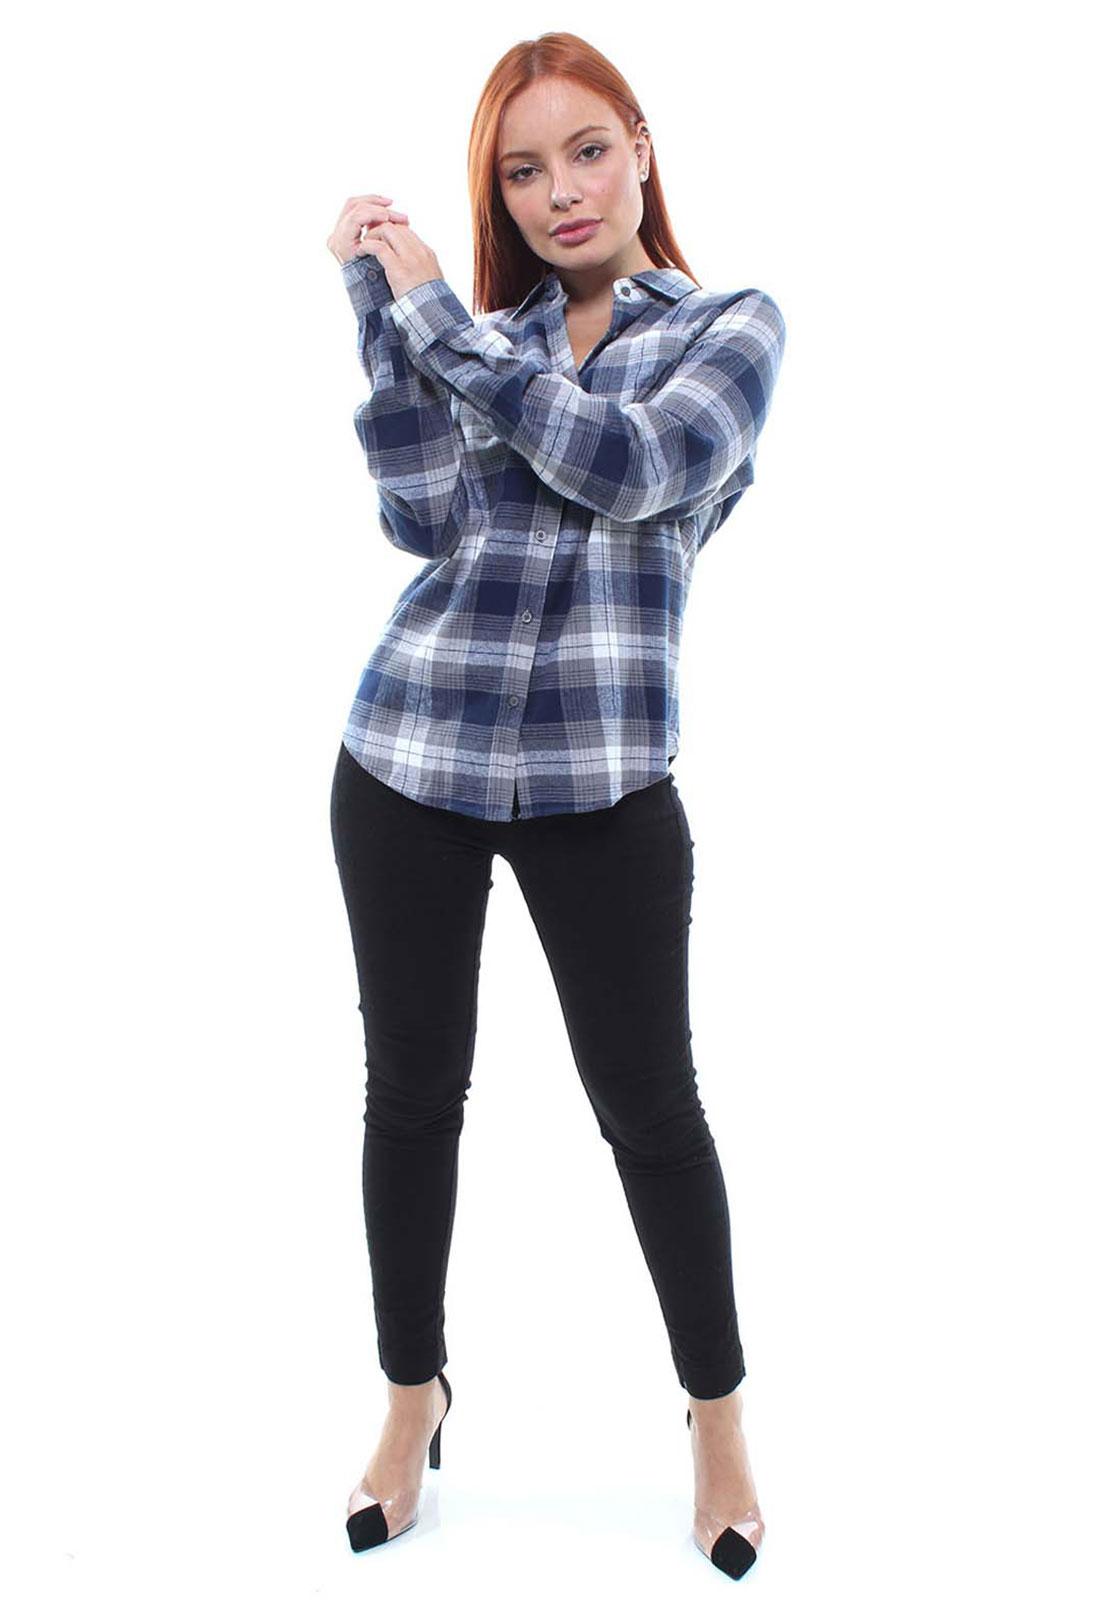 Camisa Feminina Xadrez Flanelada Crocker - 46893  - CROCKER JEANS